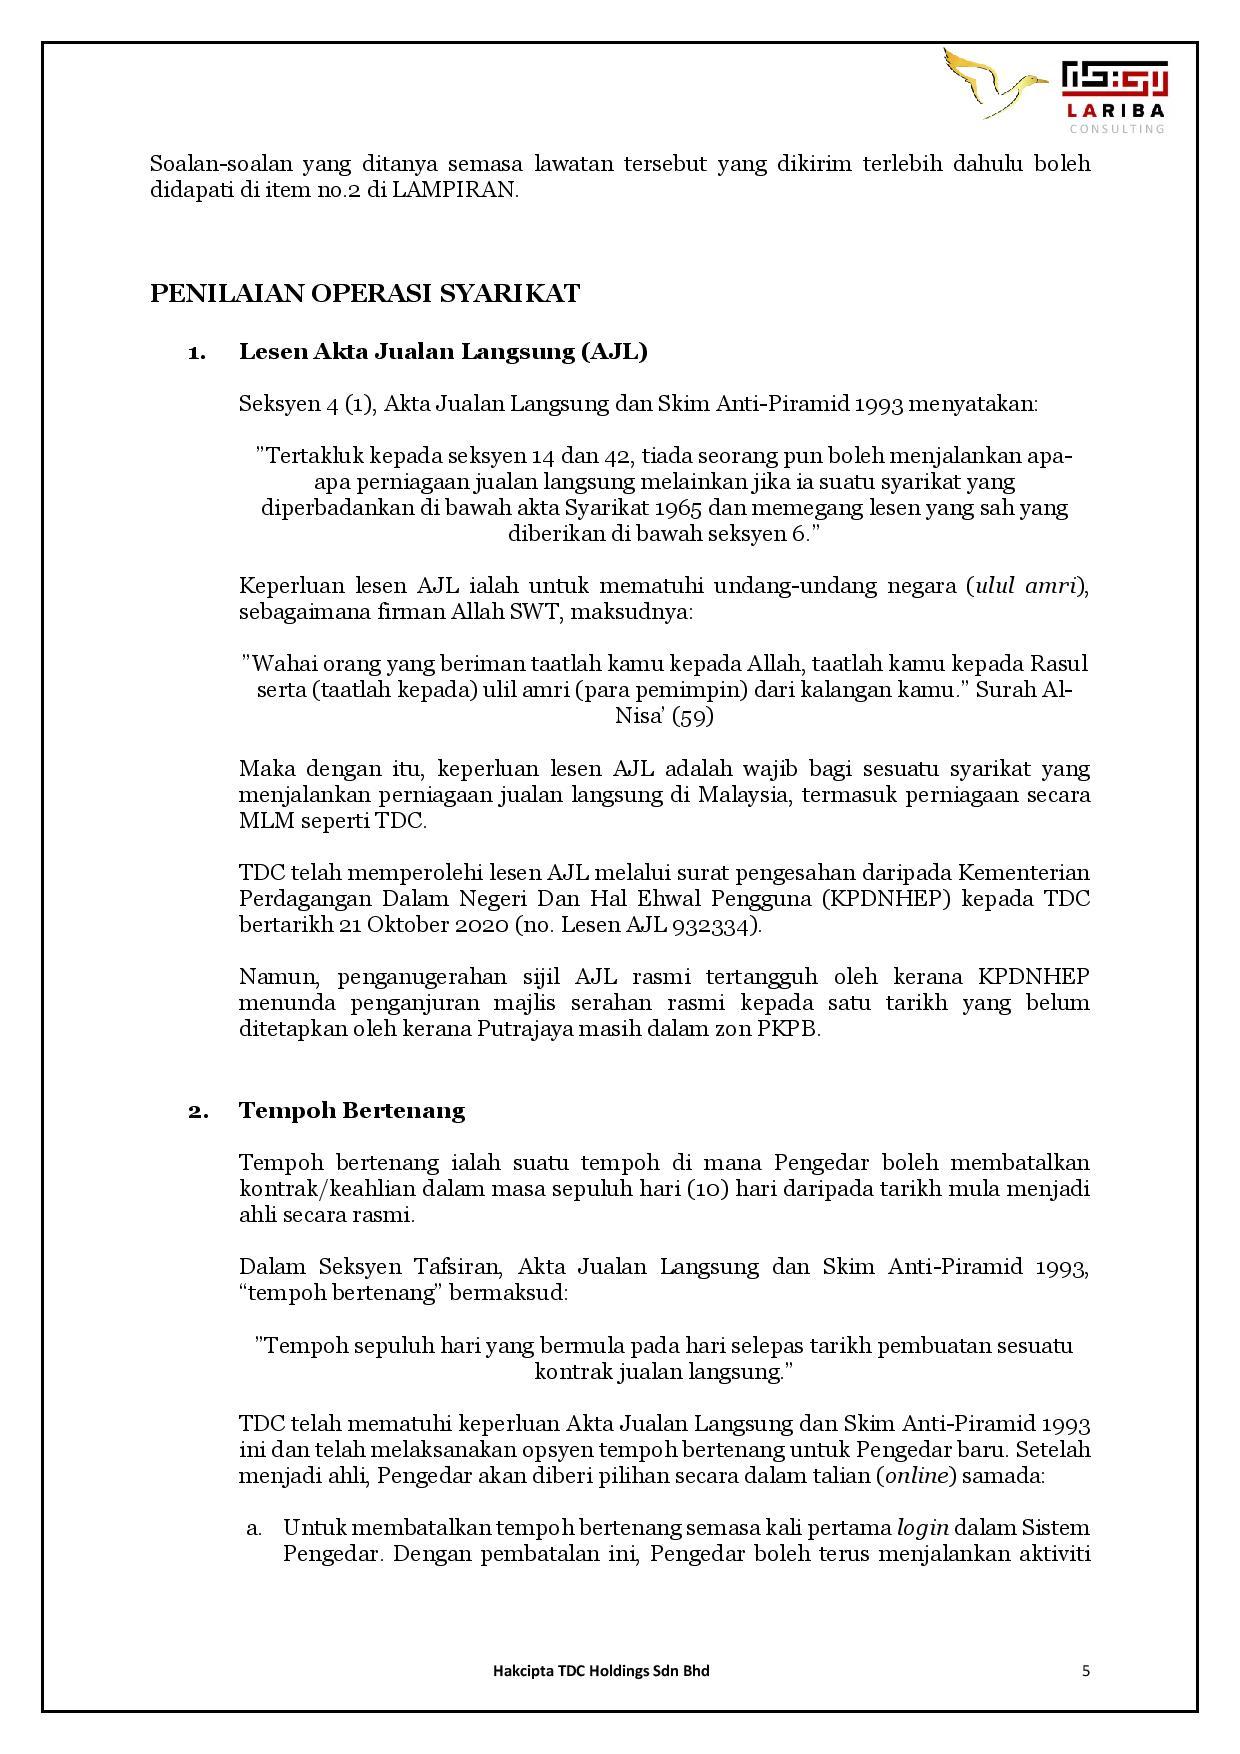 Huraian Penilaian Syariah TDC 210121 (1)-page-005